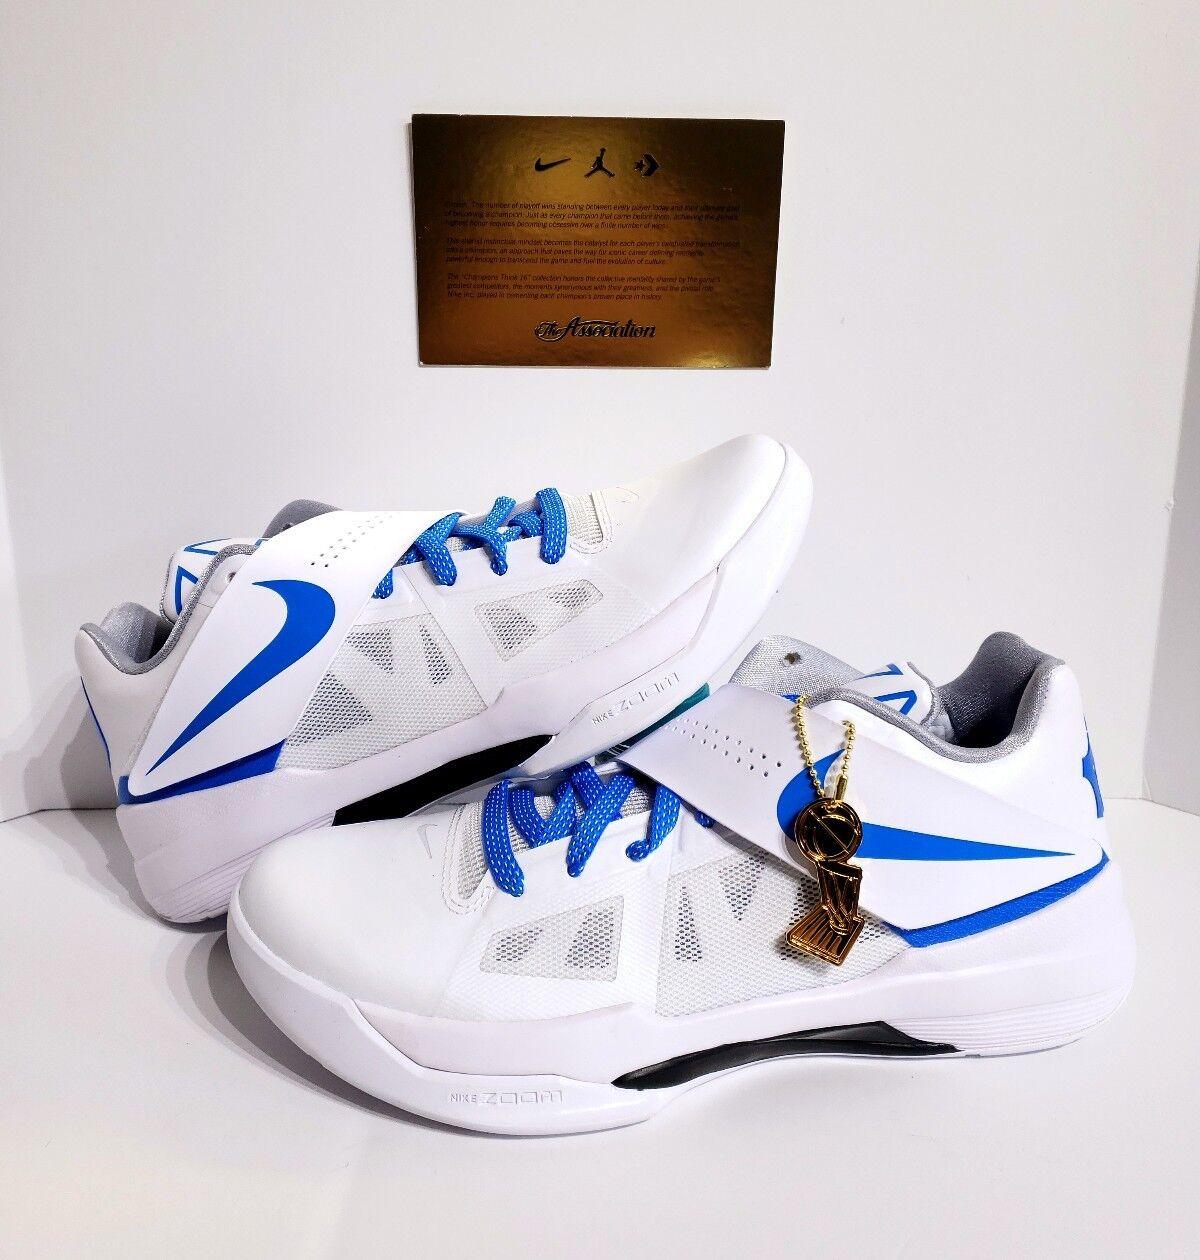 Nike KD 4 IV CT16 QS Blue Thunderstruck Mens AQ5103-100 White Blue QS Shoes Size 12 c22f68